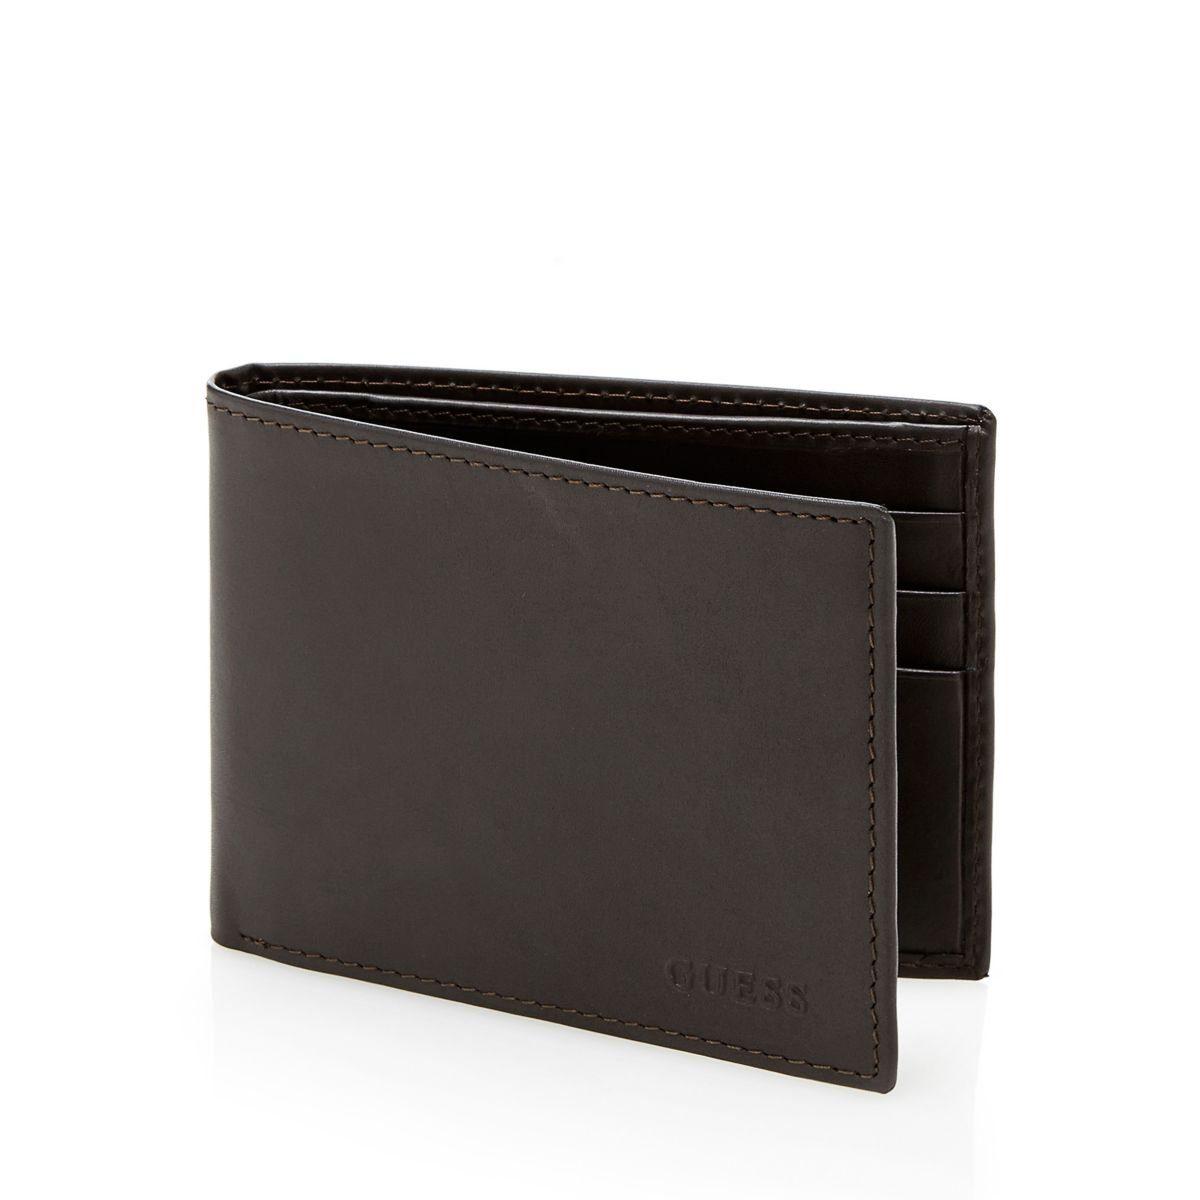 Guess Wallets BLACK BASIC FLAT BILLFOLD